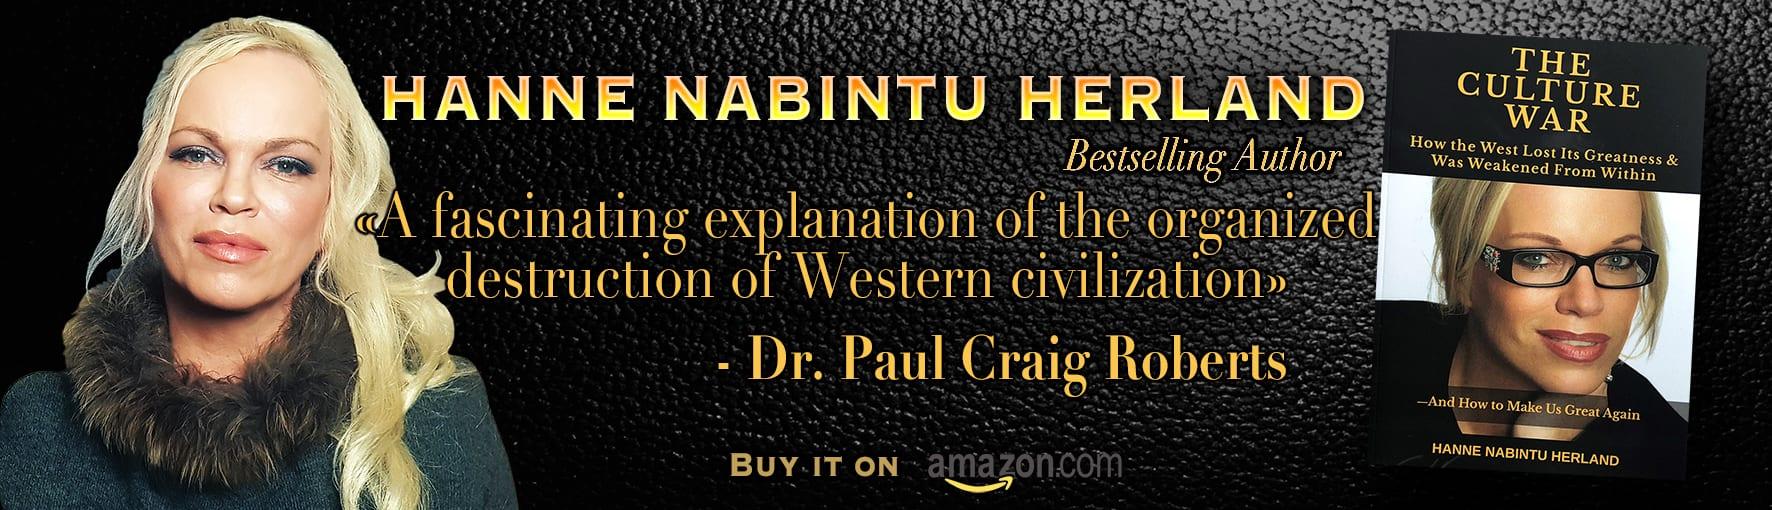 Culture War Hanne Nabintu Herland banner